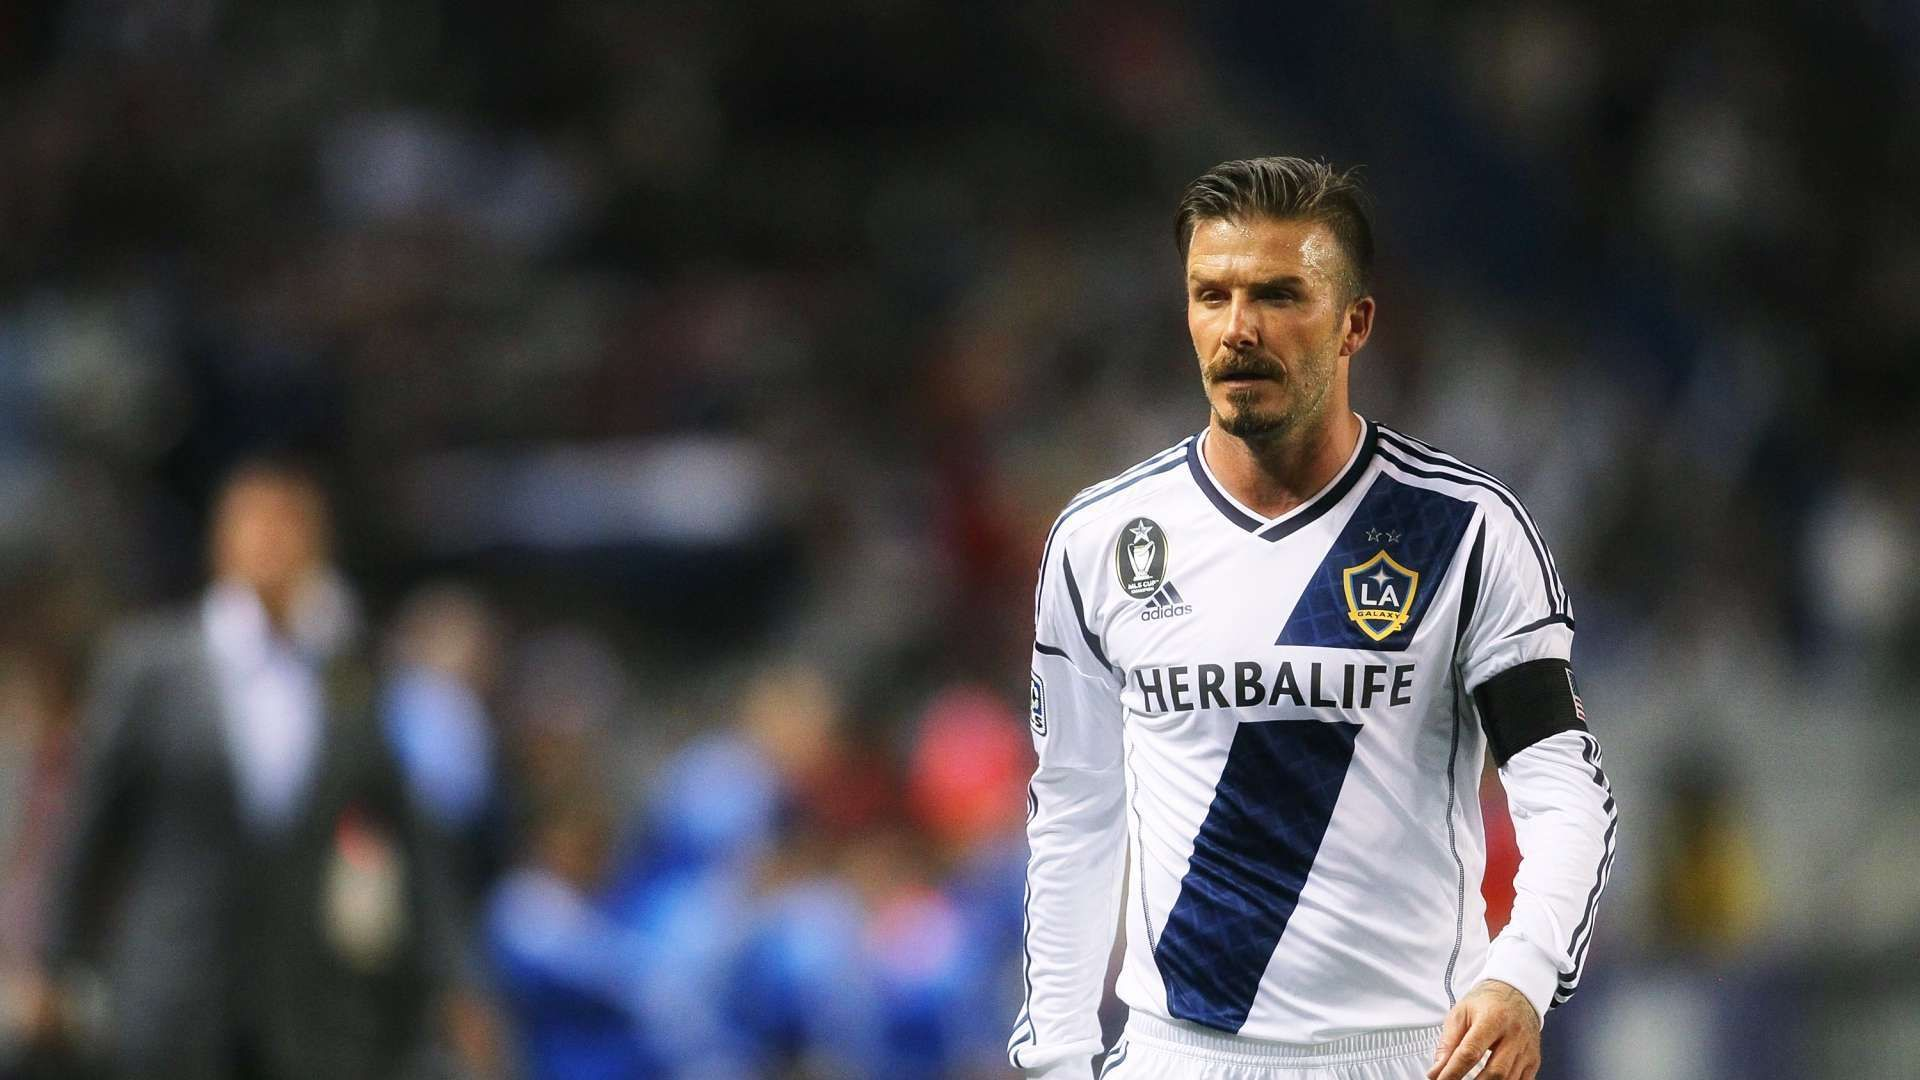 David Beckham Los Angeles Galaxy Midfielder Football Hd